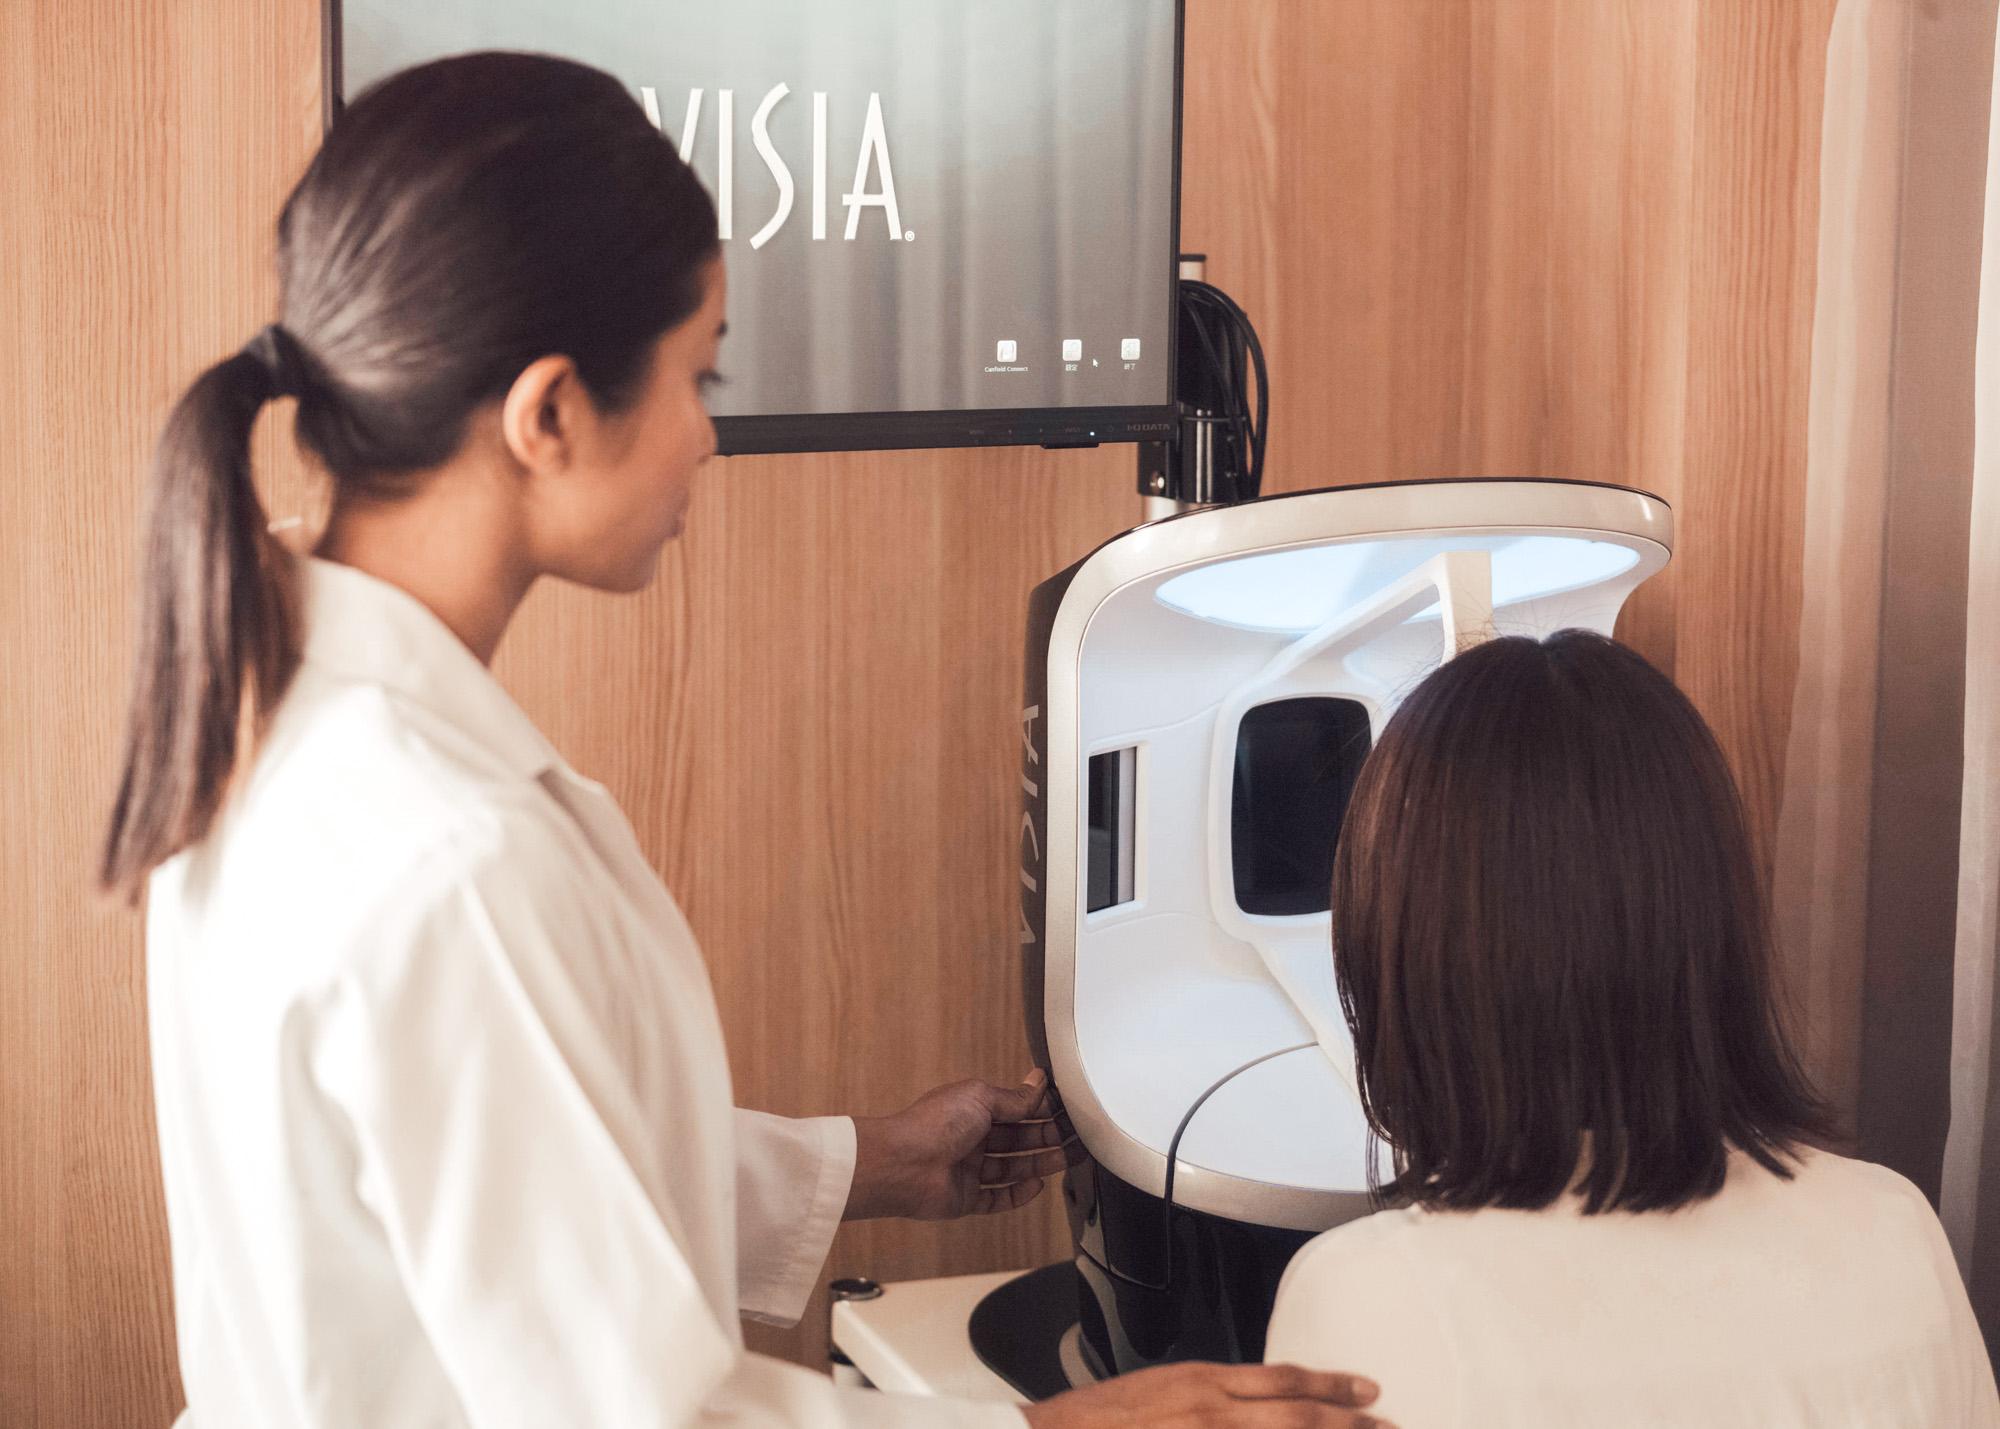 肌診断機 VISIA